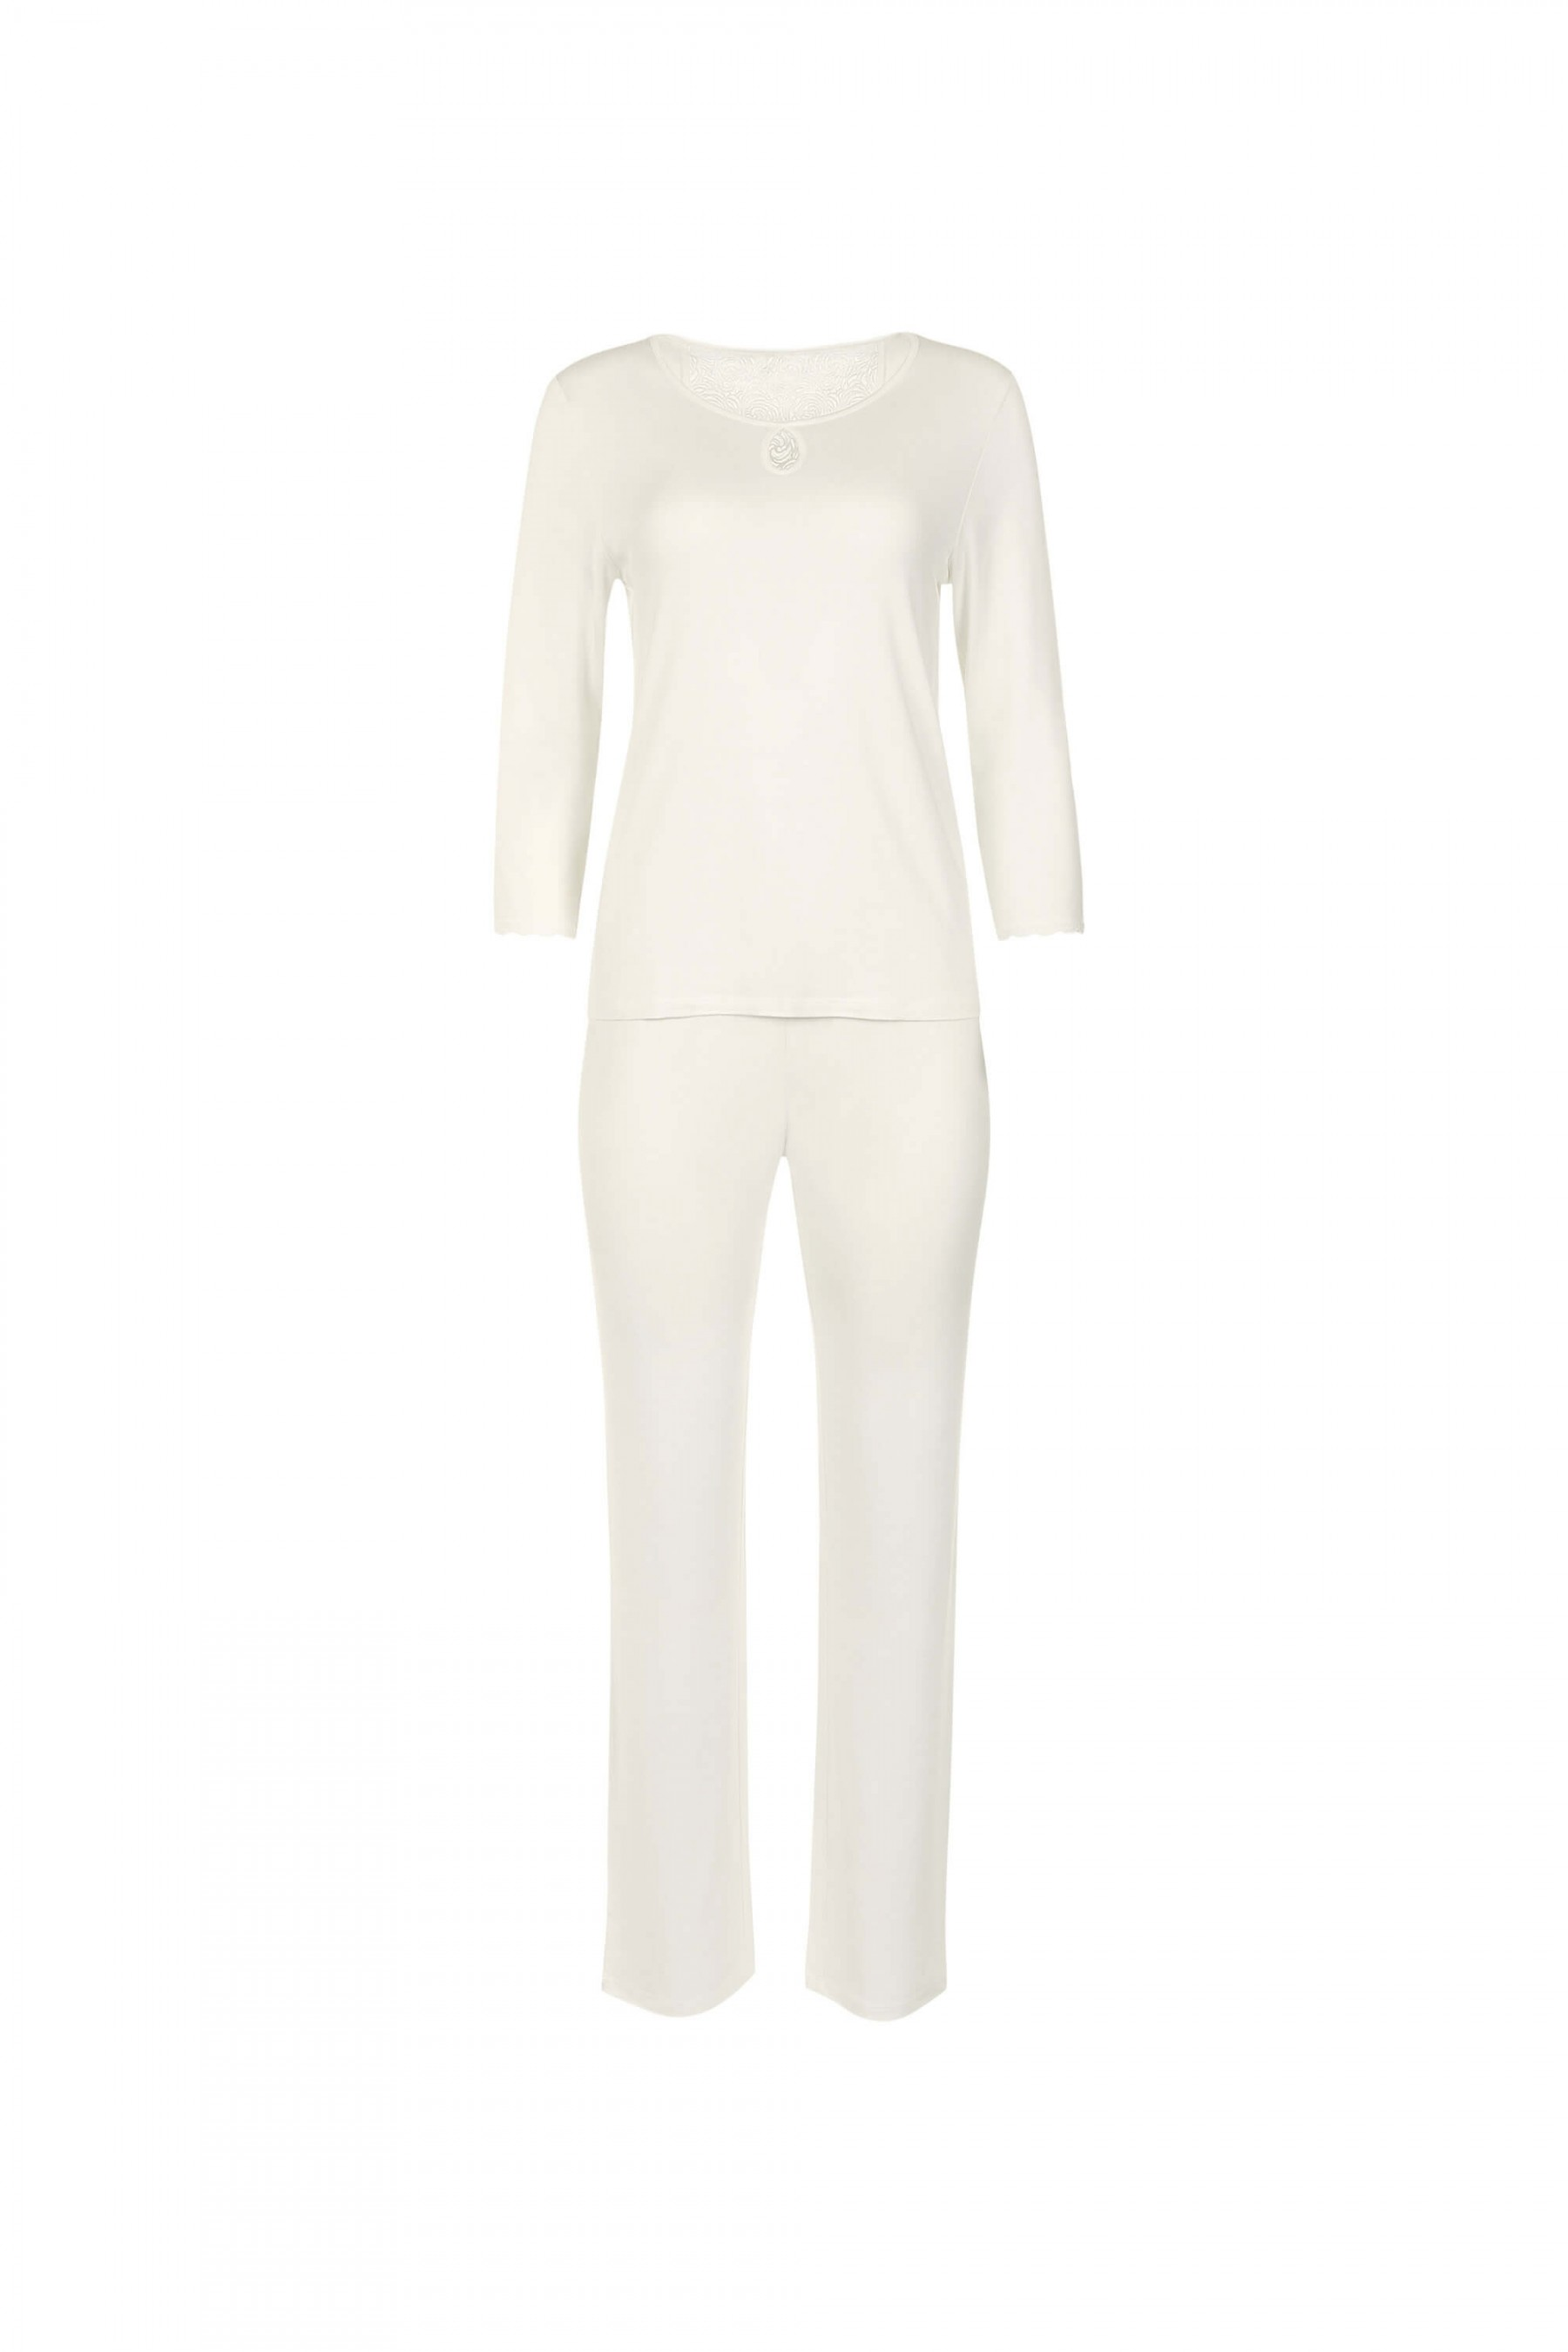 23264 - »Felicity« Pyjama top and bottoms